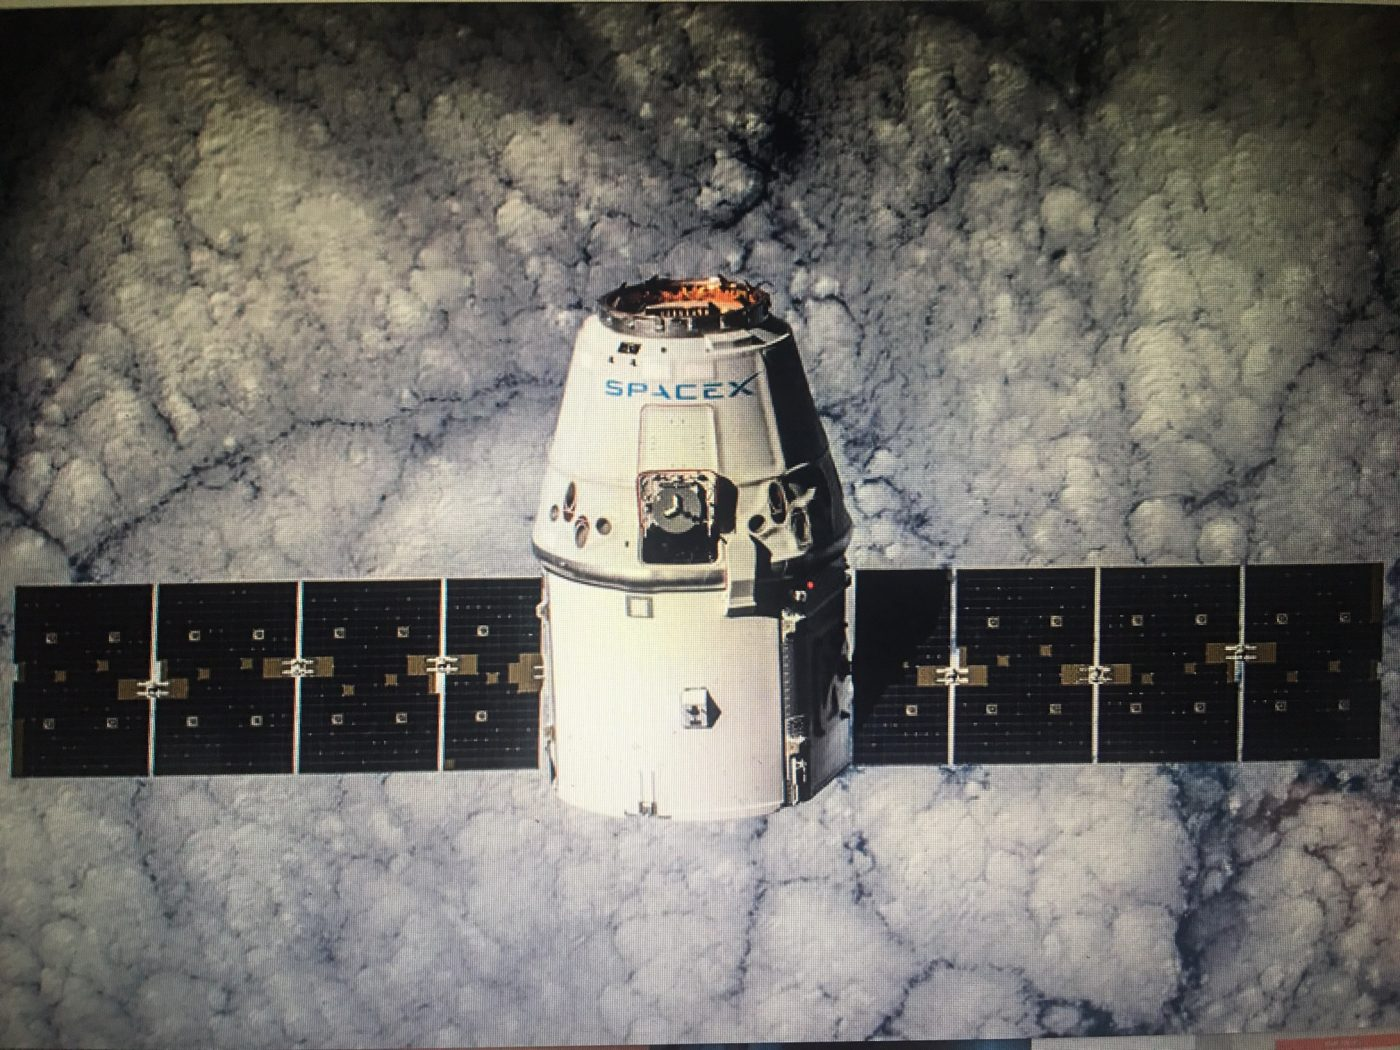 CRS5 Dragon in Orbit